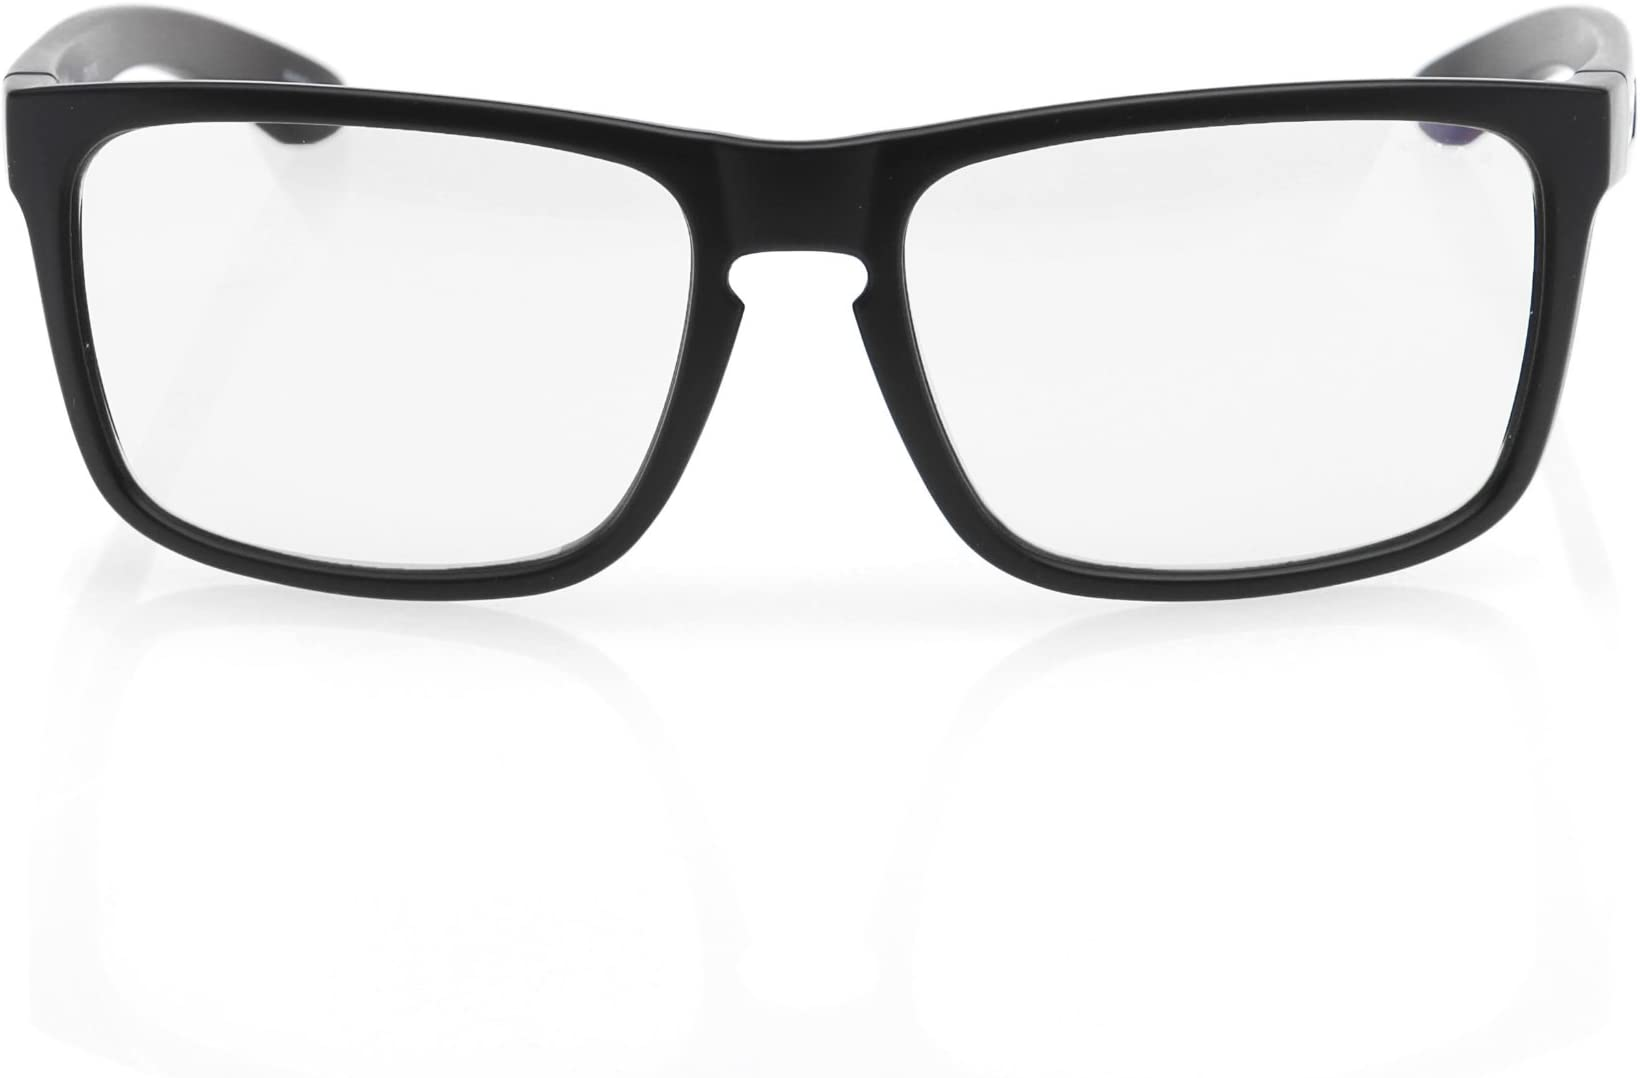 9f43dcb3fe0 Amazon.com  GUNNAR Gaming and Computer Eyewear  Intercept - Patented ...